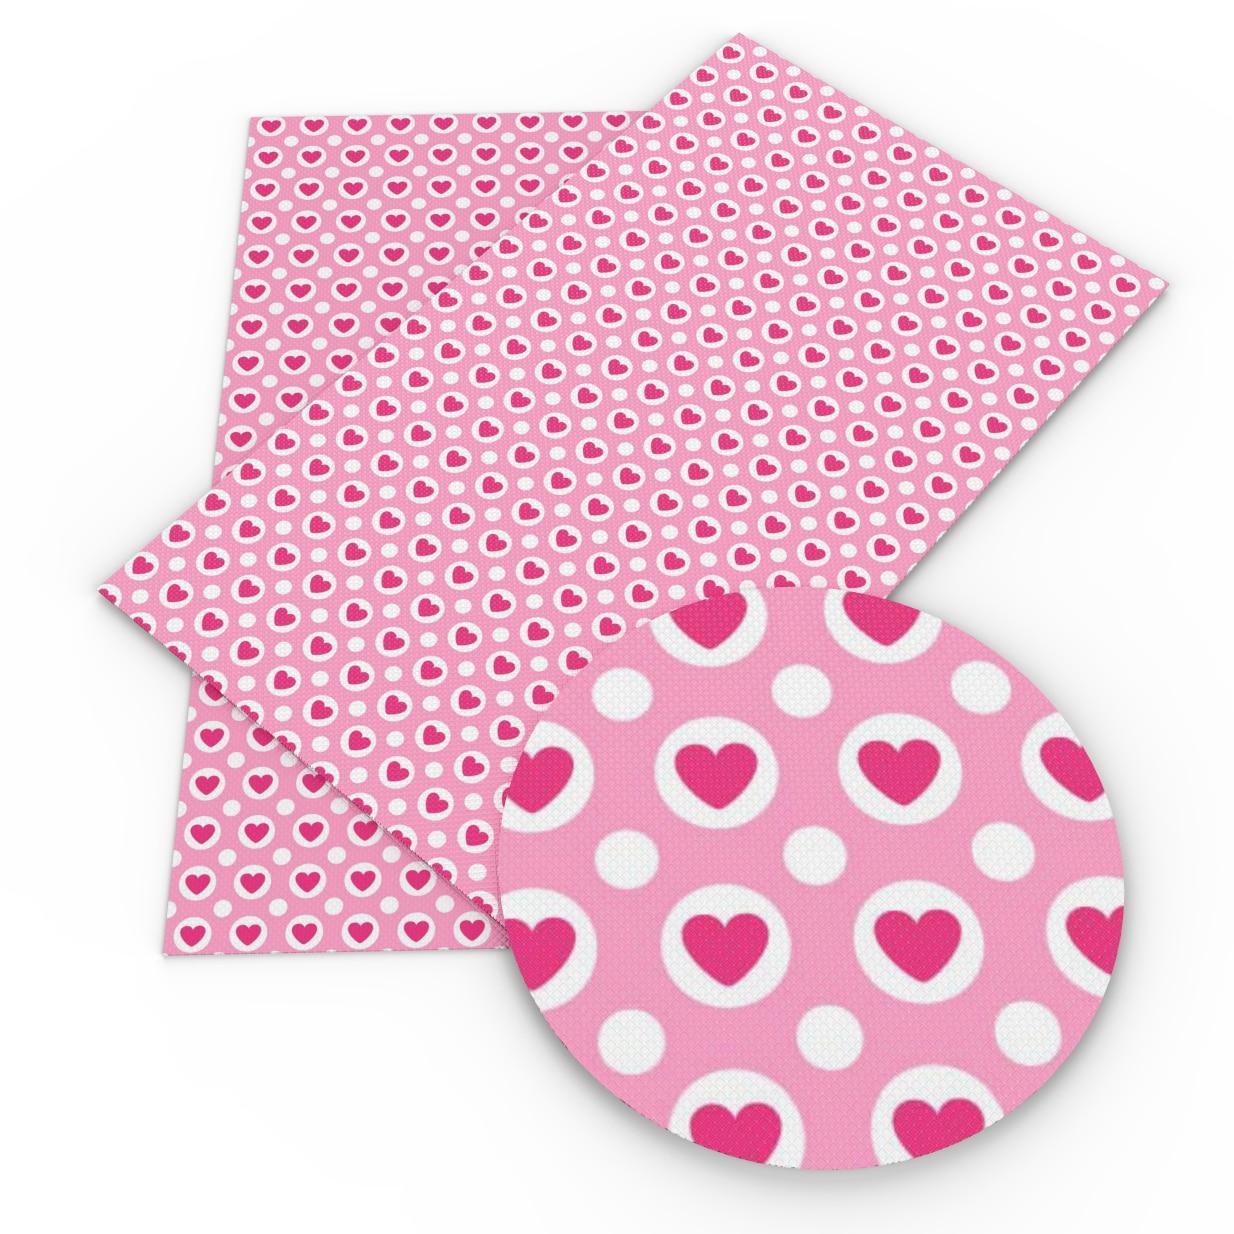 50*140CM Día de San Valentín corazón impreso poliéster tela de algodón para acolchar tela de alta calidad transpirable, c11375